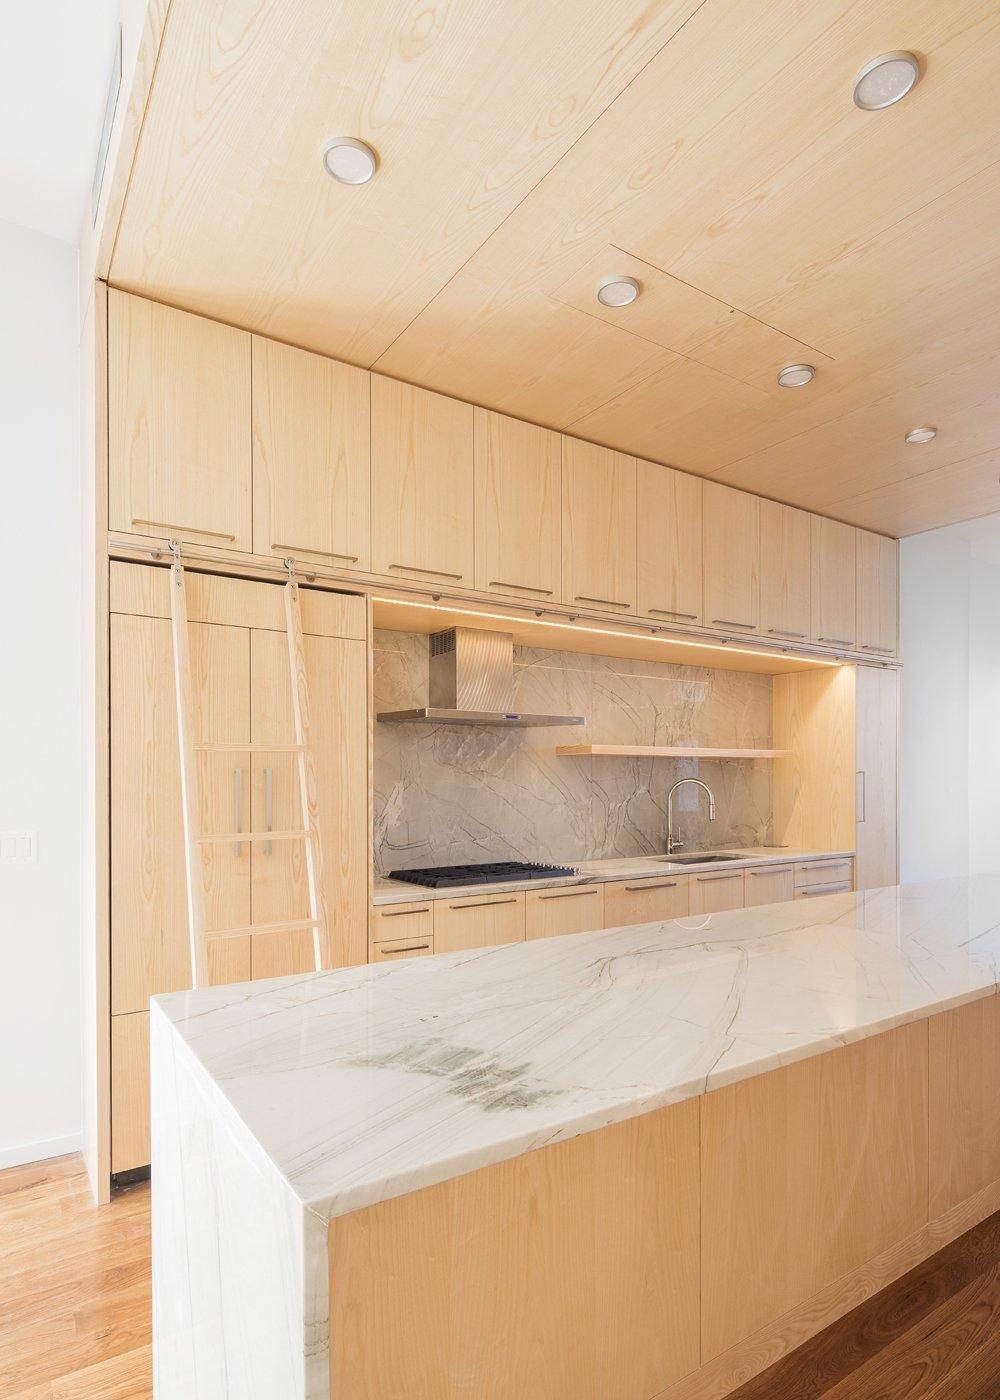 Kitchen, Range, Range Hood, Marble Counter, Medium Hardwood Floor, Marble Backsplashe, and Wood Cabinet  Wayne Street Row House by Jeff Jordan Architects